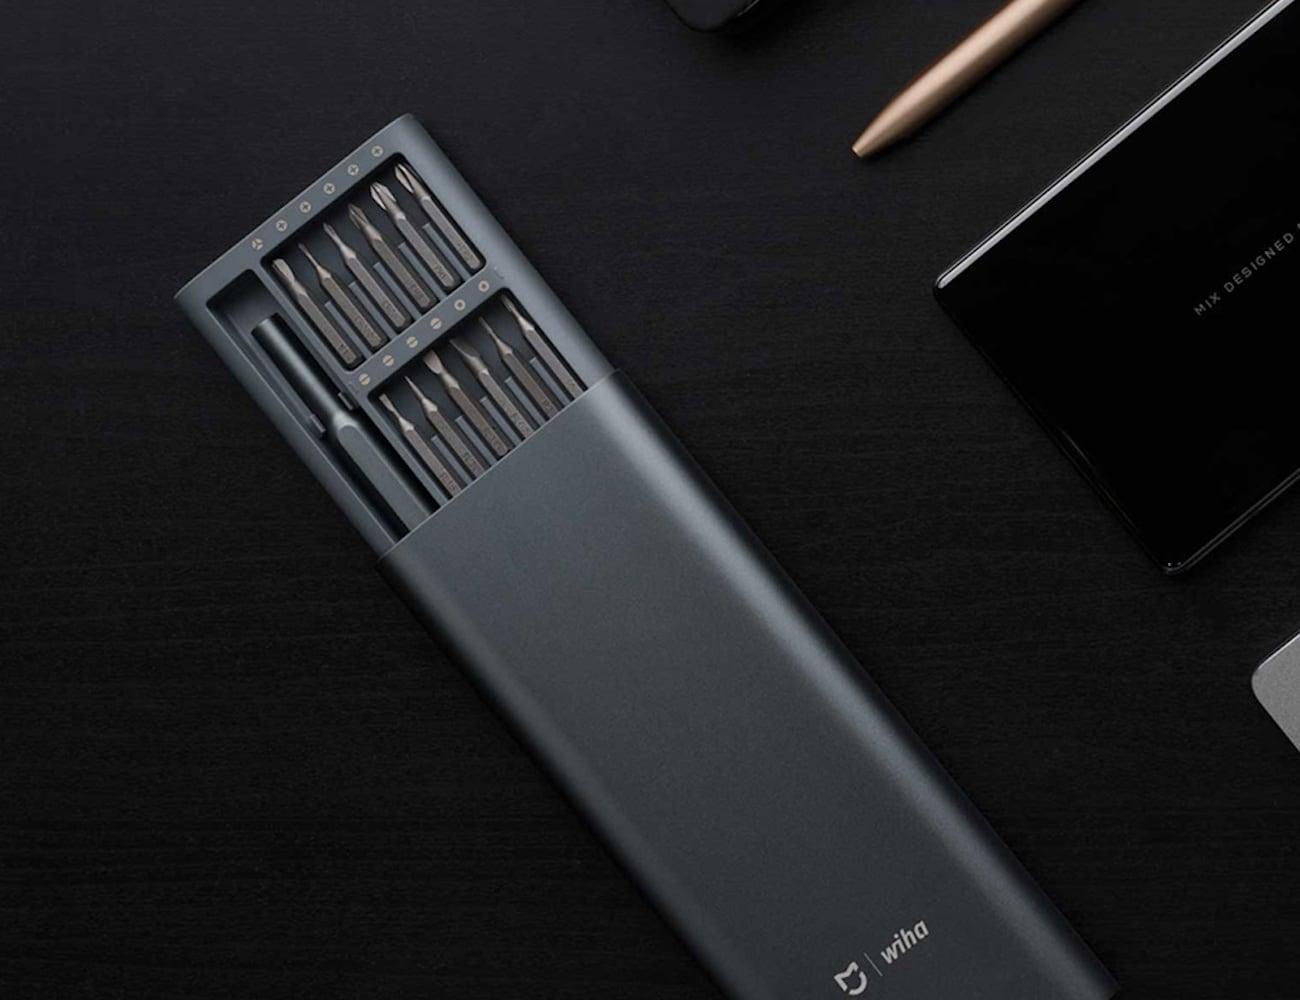 Xiaomi Wiha Precision Screwdriver Set has 24 magnetic bits for accuracy